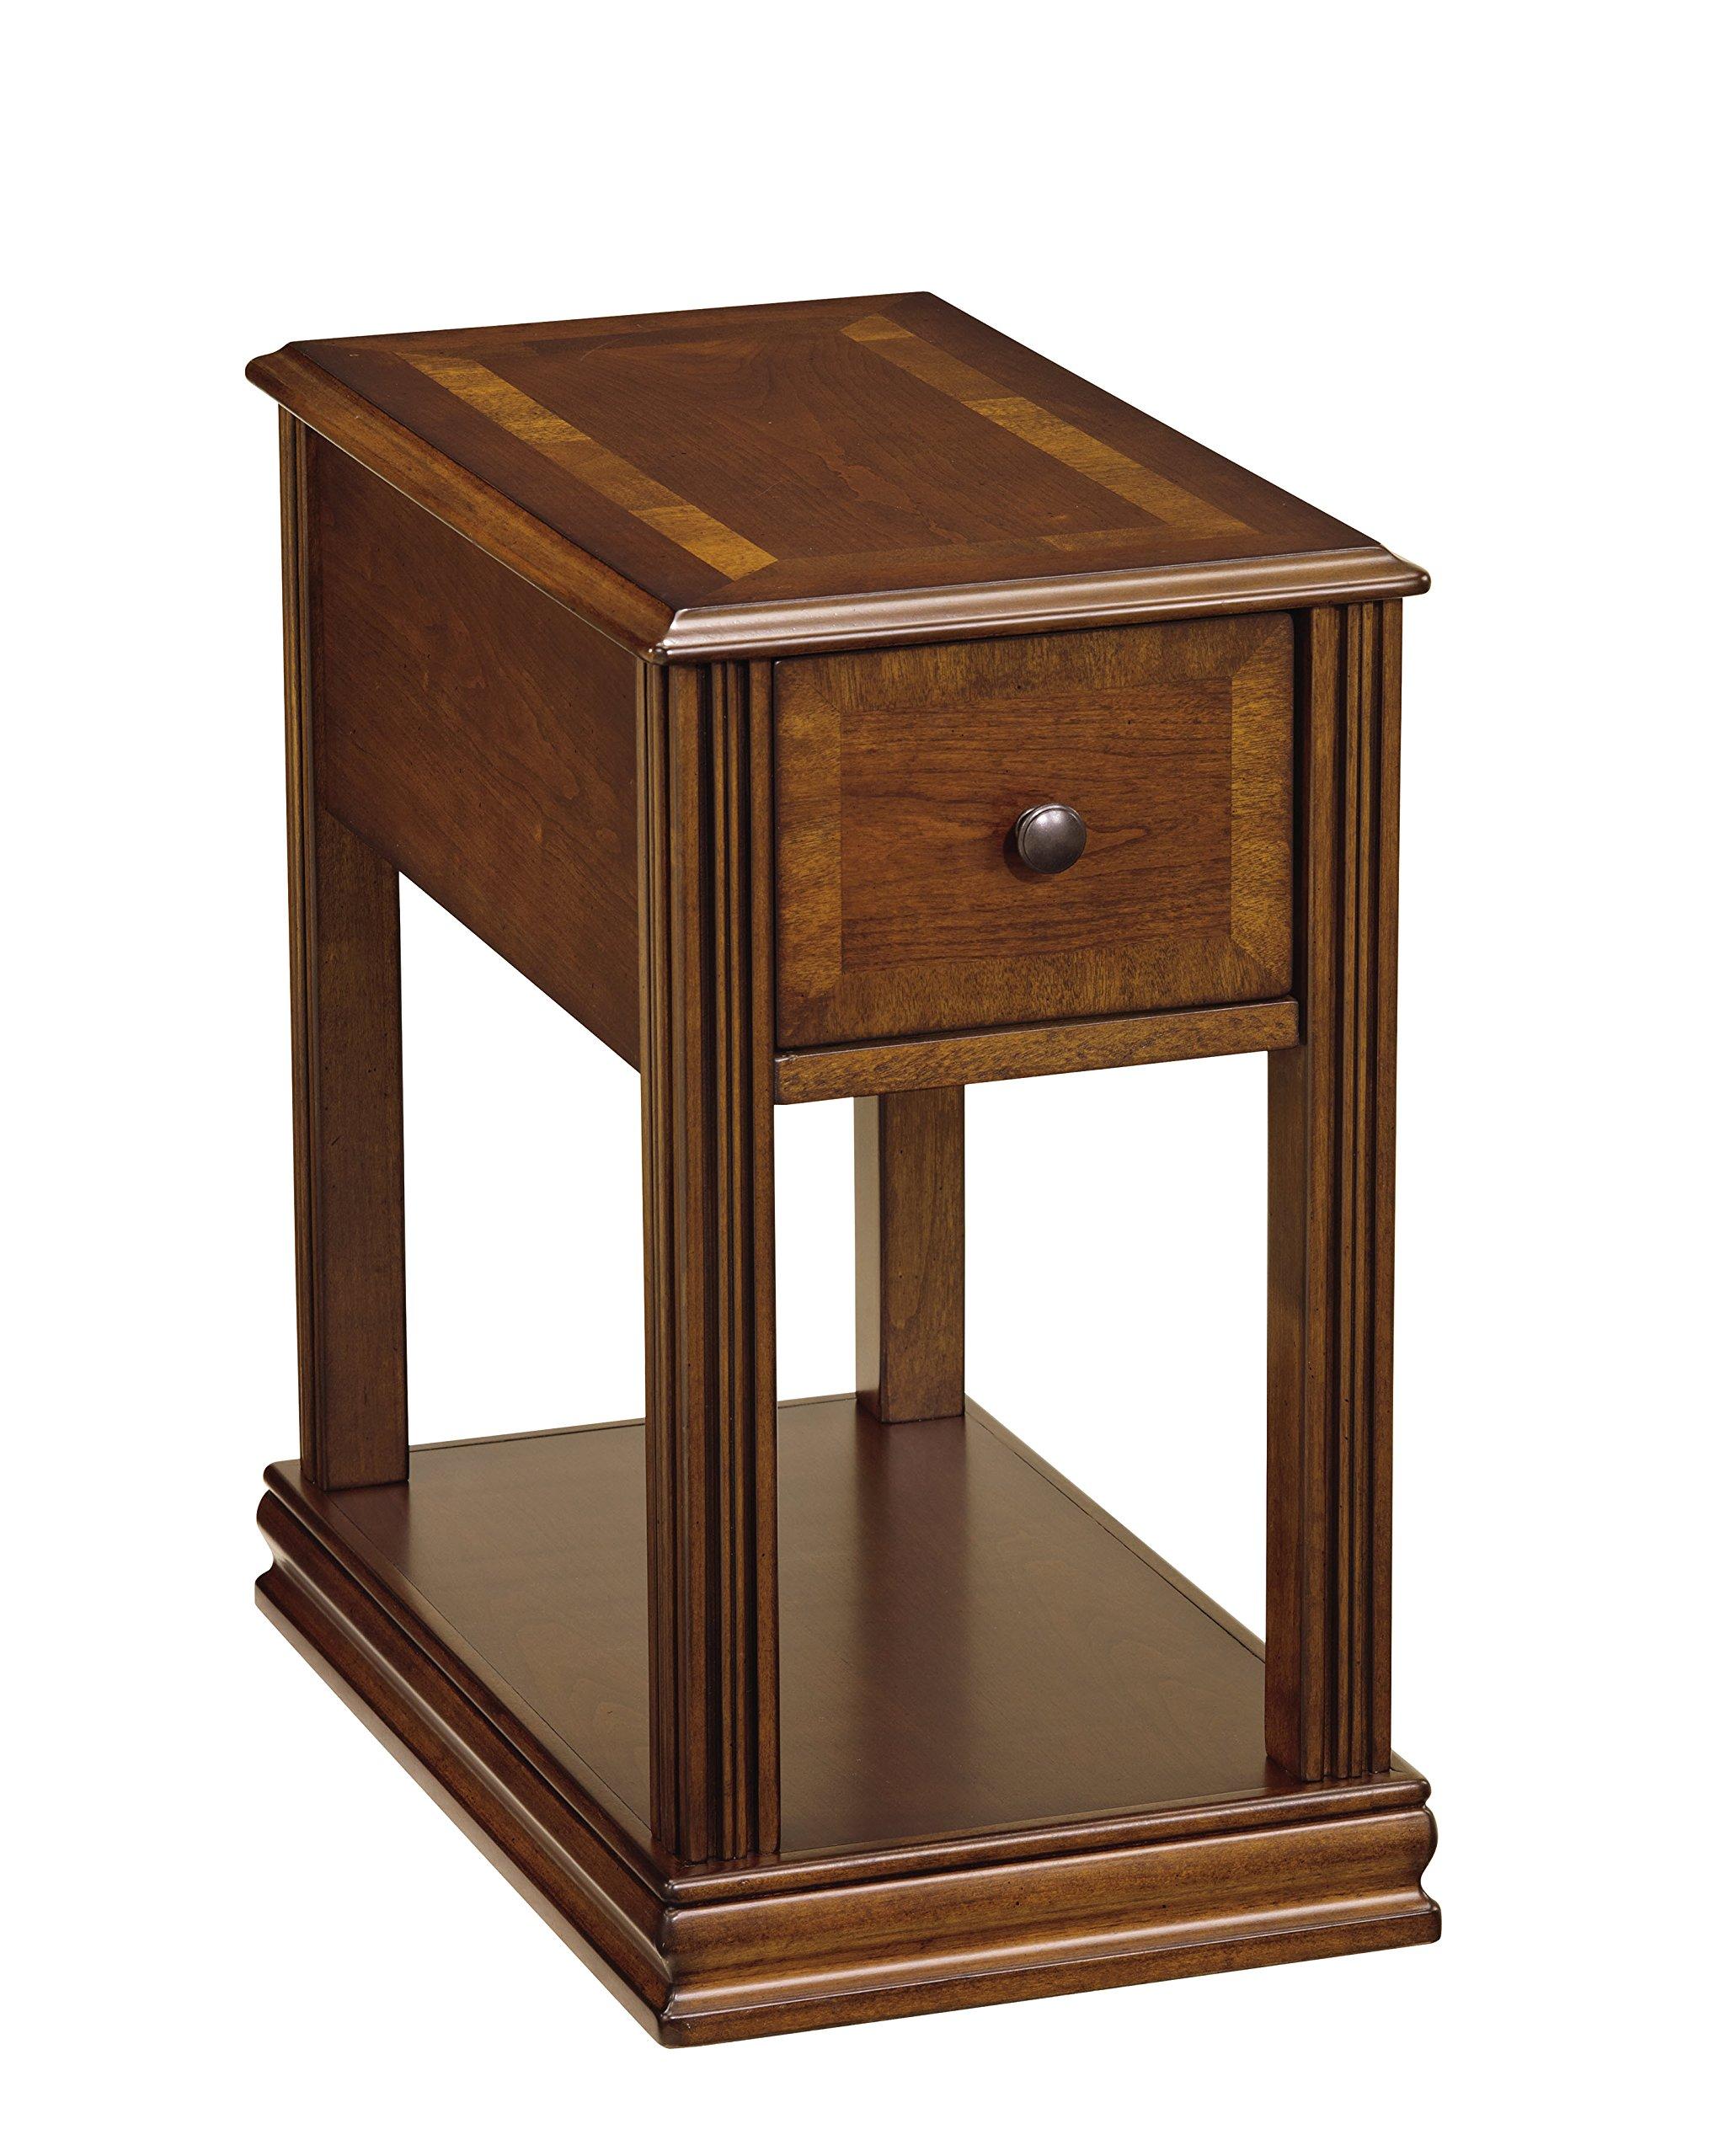 Ashley Furniture Signature Design - Breegin Contemporary Chair Side End Table - Rectangular - Brown Finish